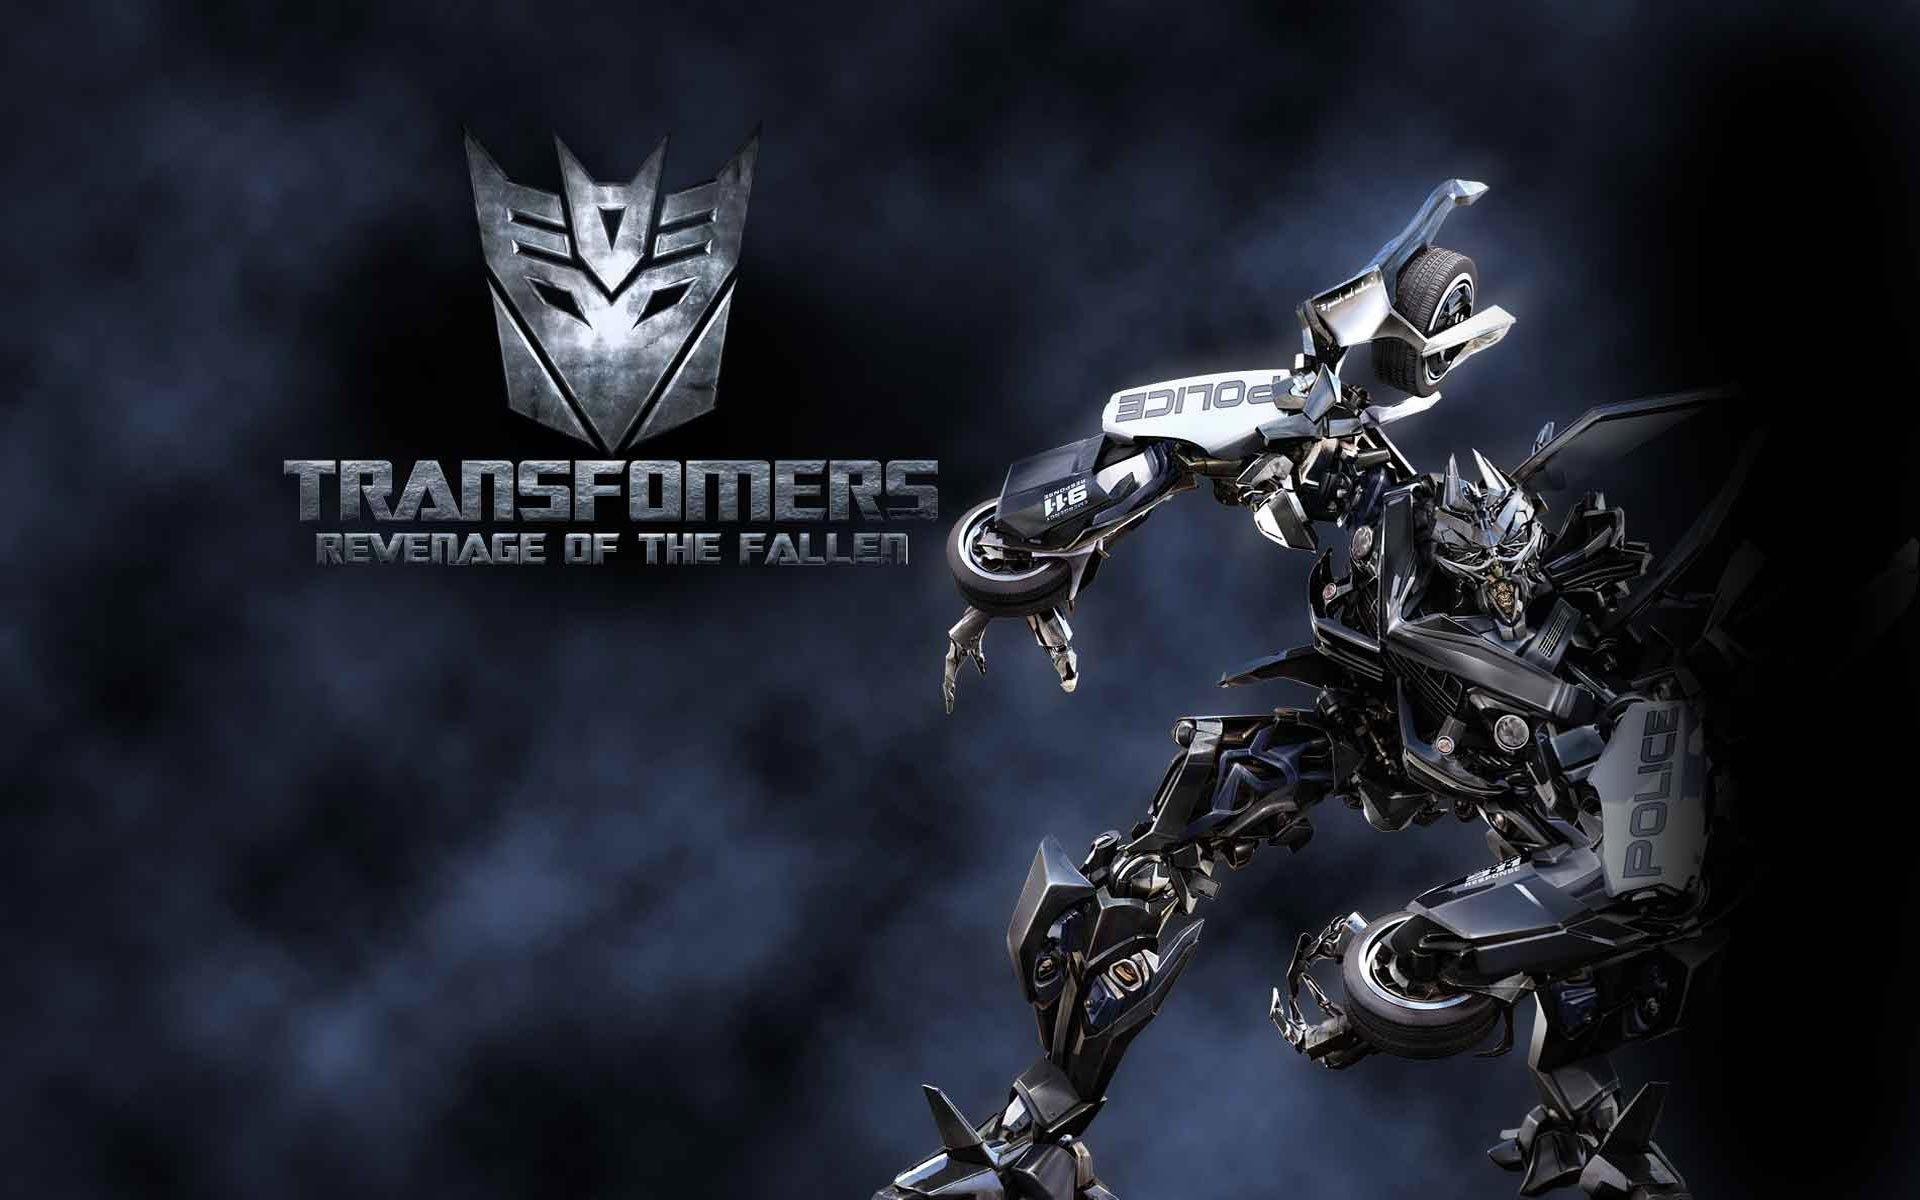 Transformers Revenge Of The Fallen Wallpapers 1920x1200 Desktop